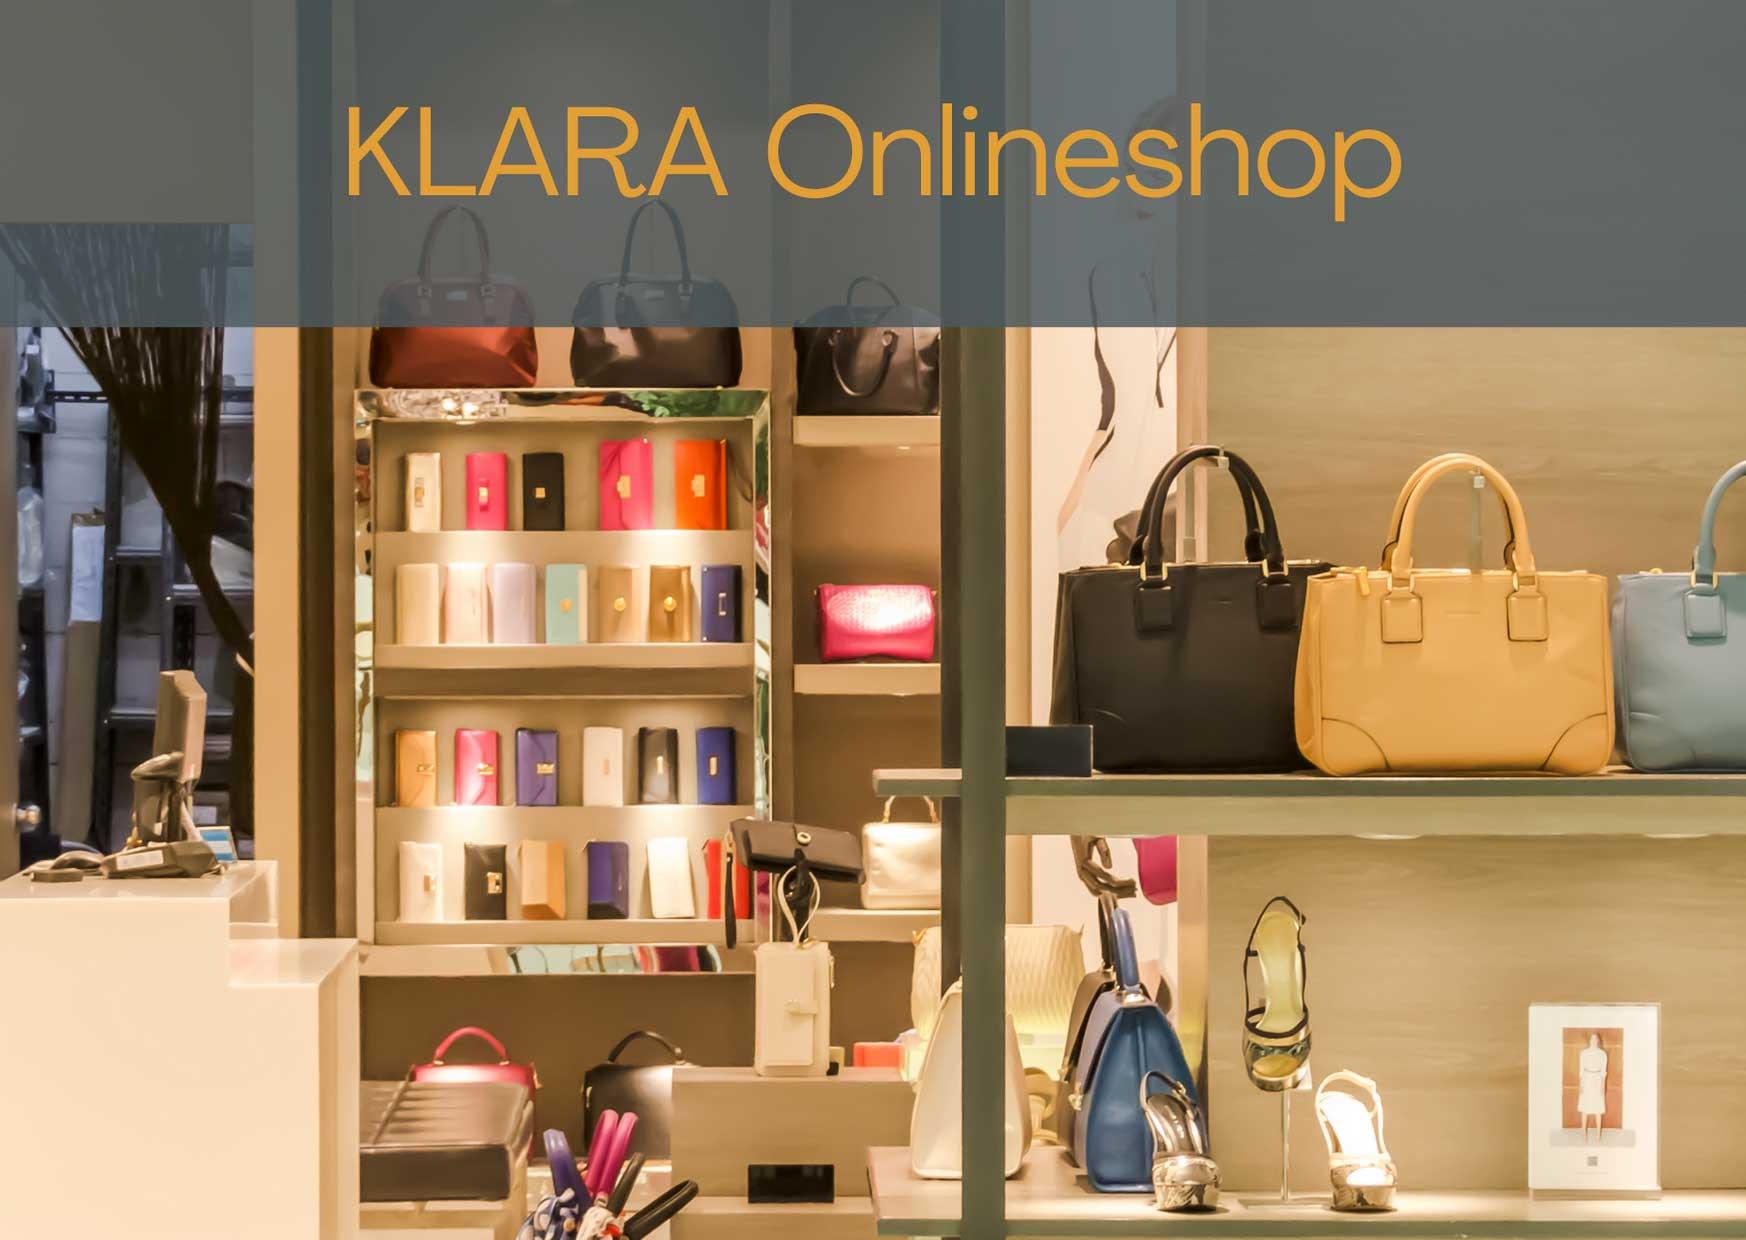 klara_onlineshop